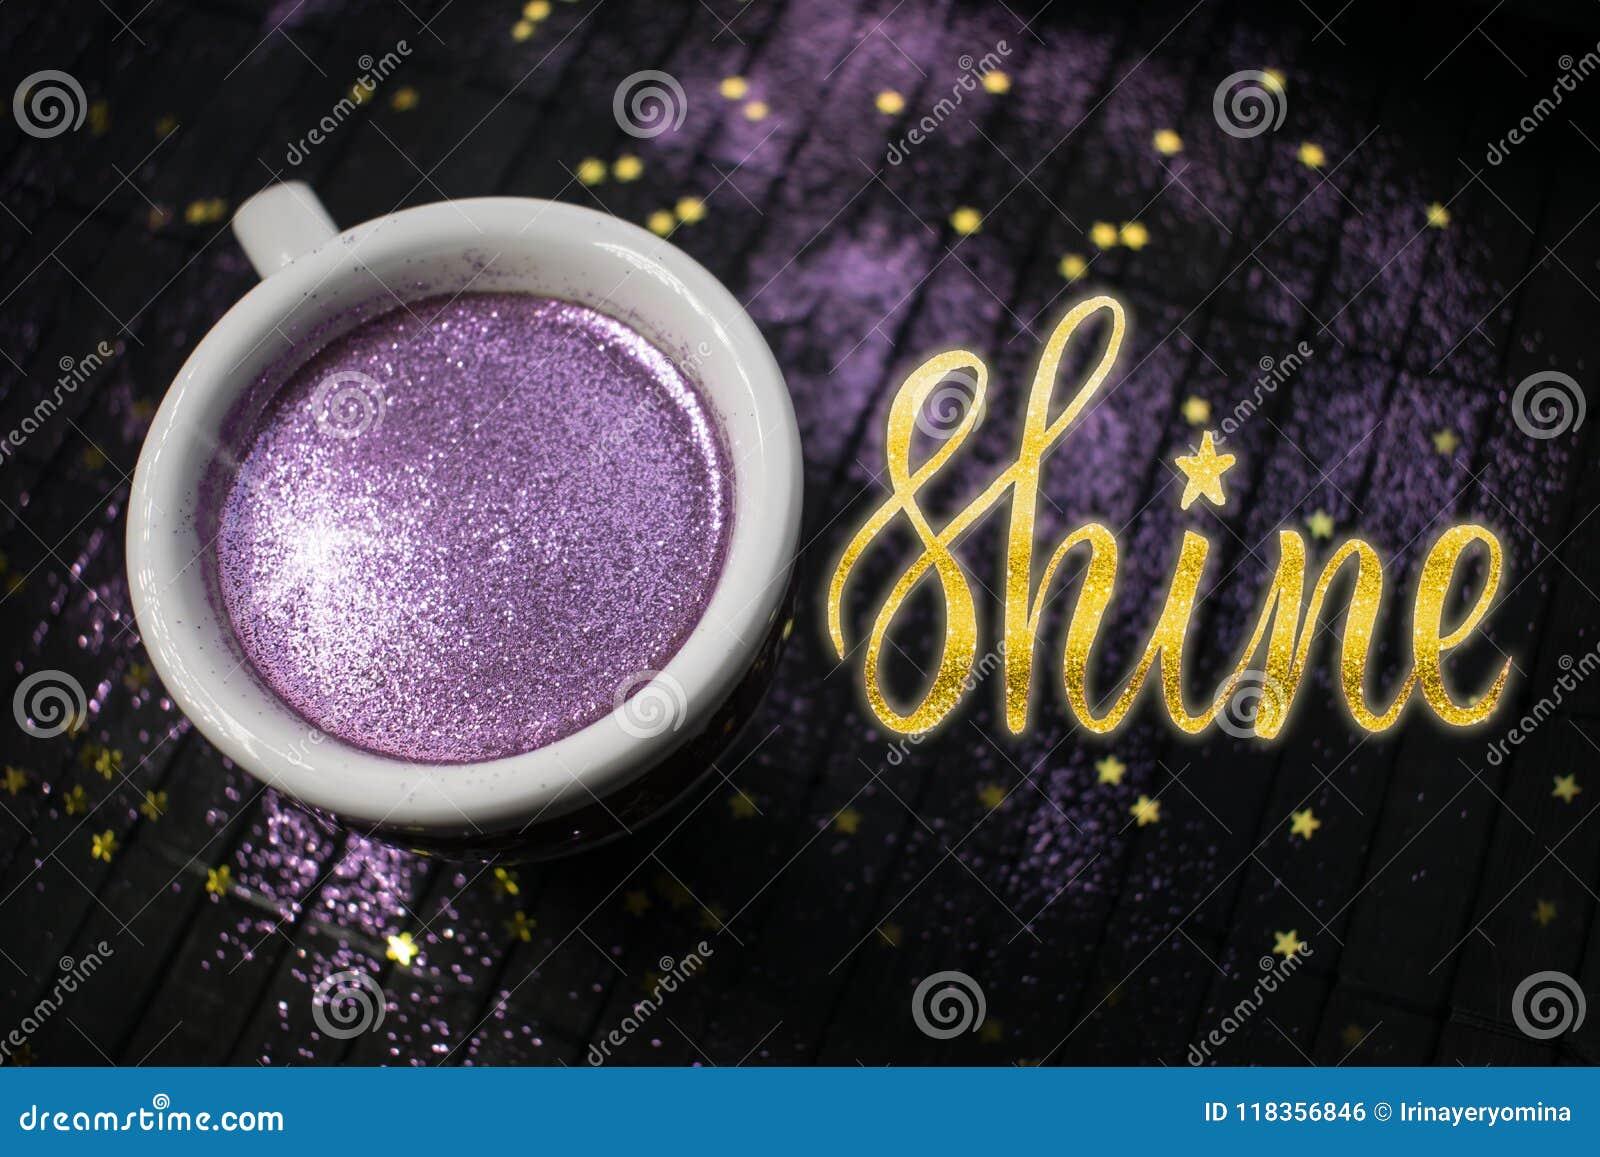 Taza De Cafe Con Brillo Purpura En Fondo Oscuro Con De Oro Foto De Archivo Imagen De Purpura Fondo 118356846